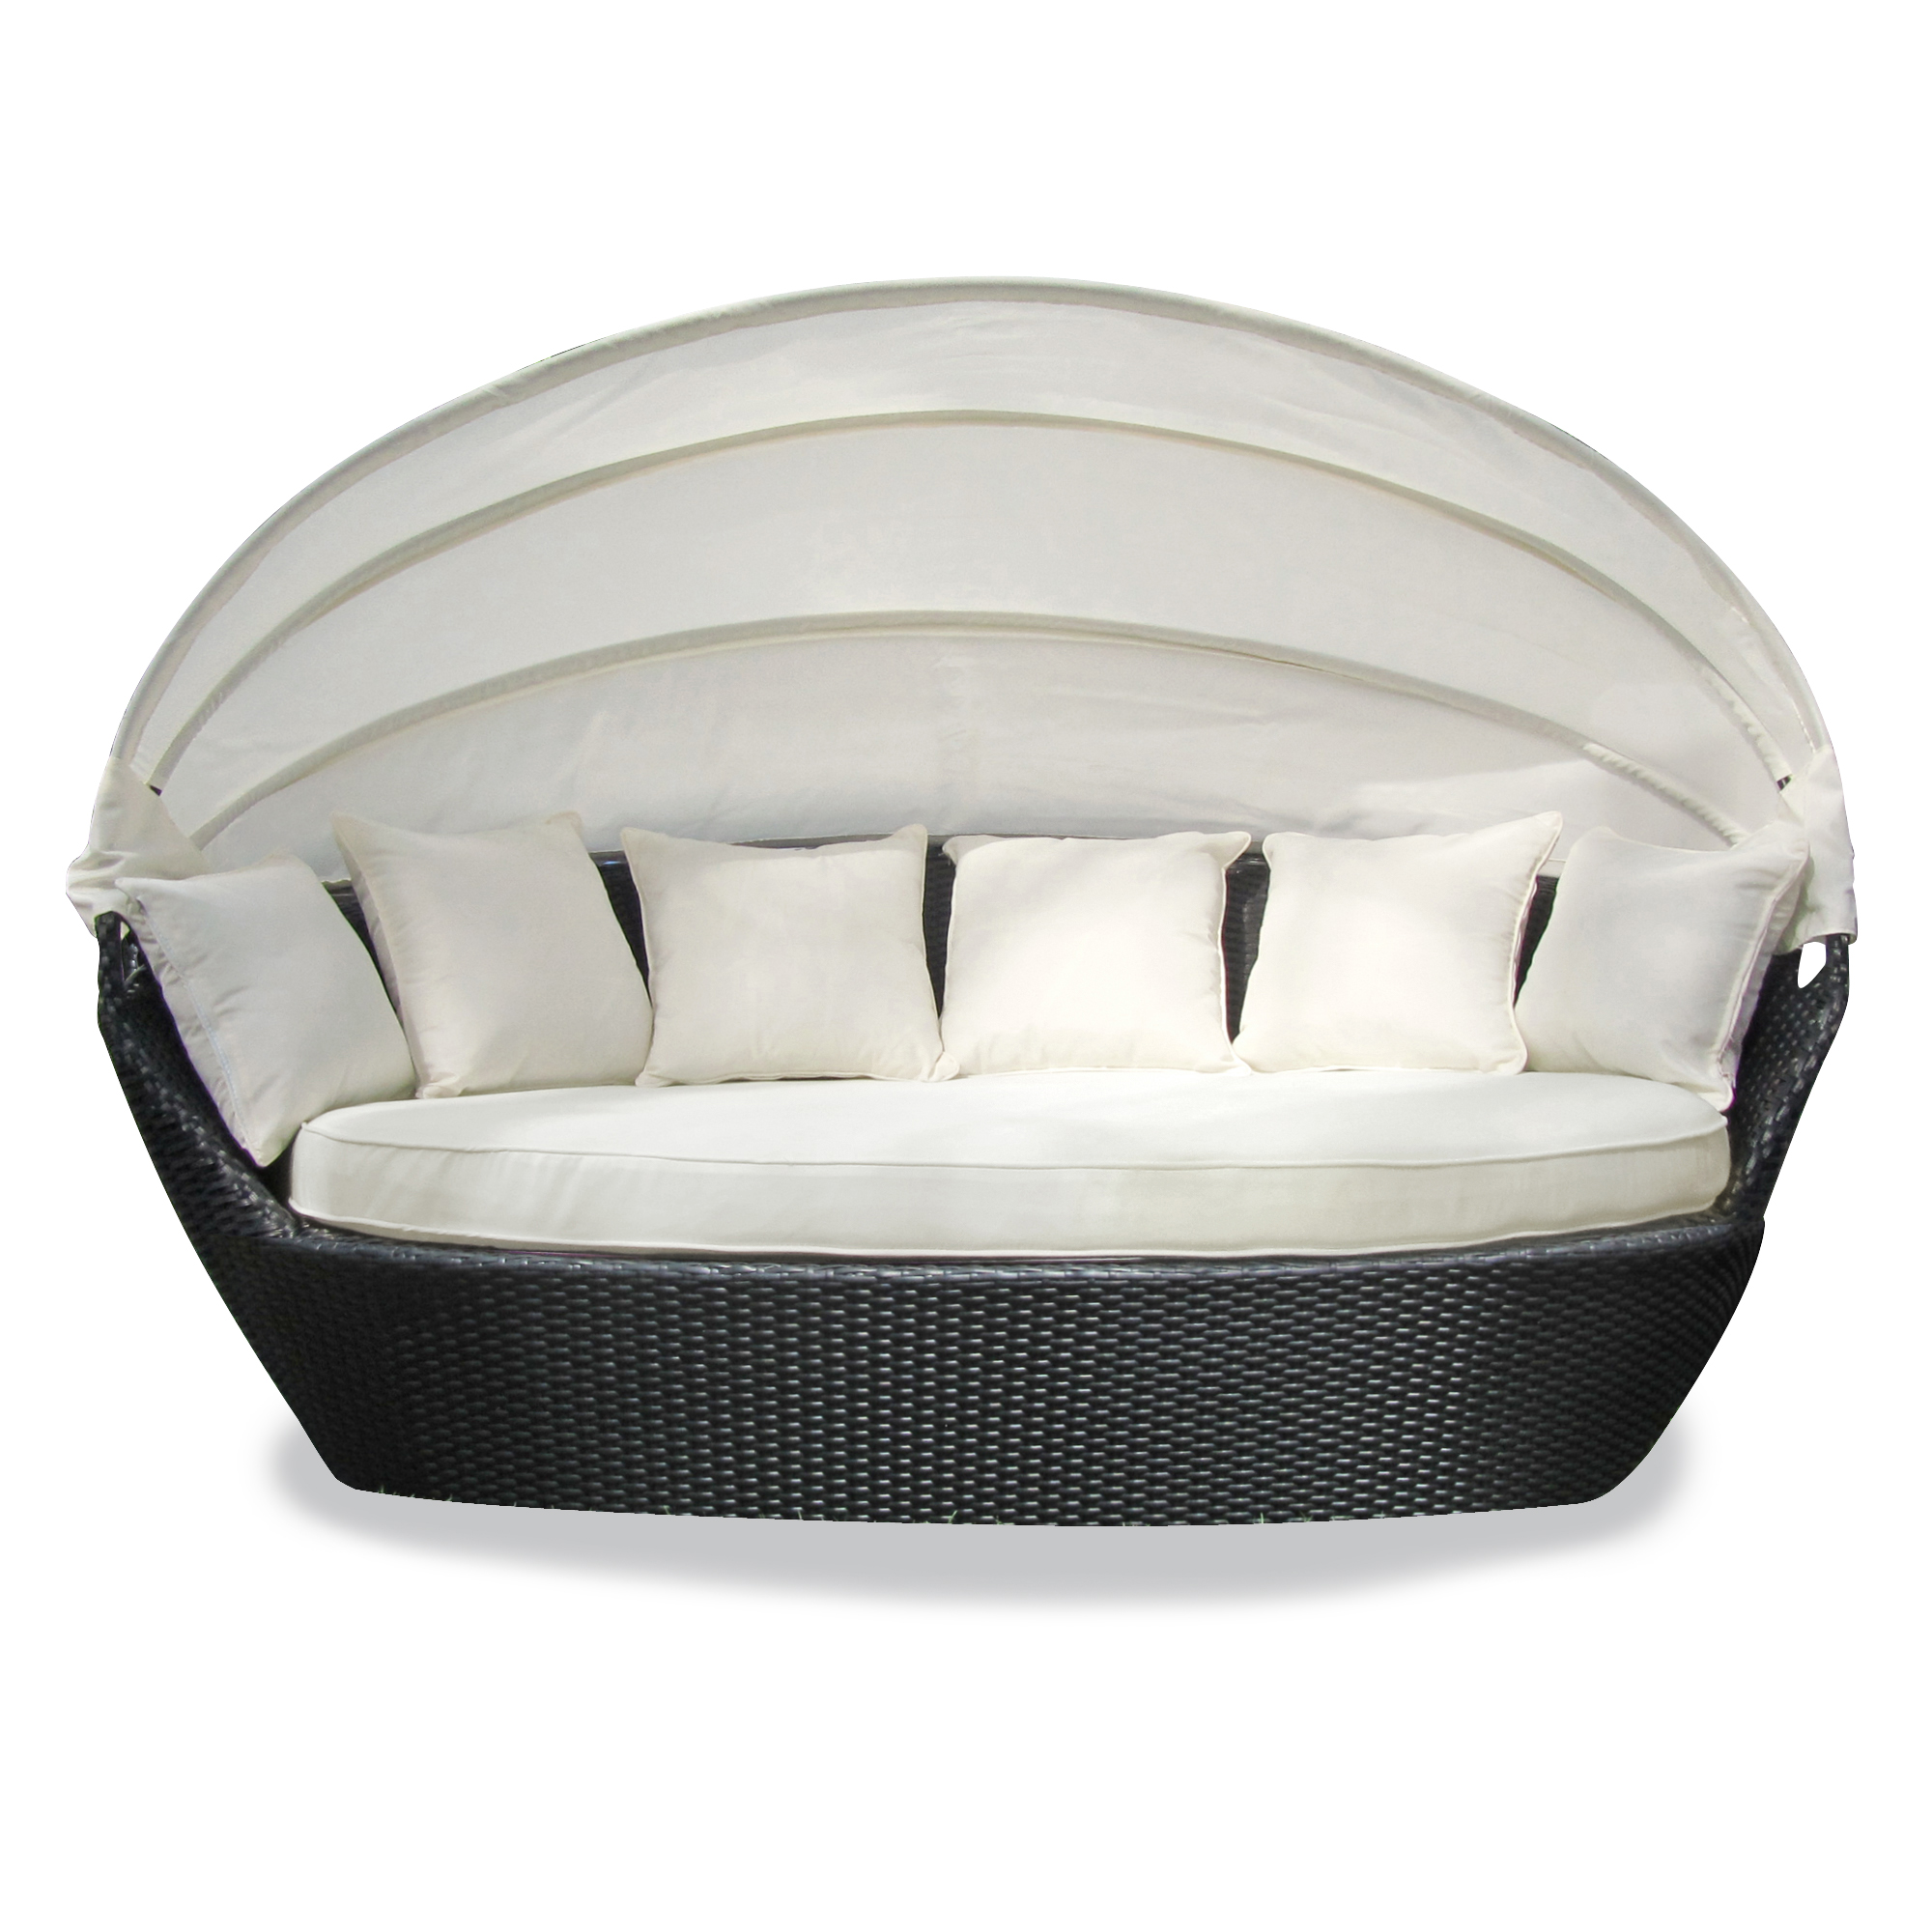 Xxl premium poly rattan sonneninsel sonnenliege strandkorb for Rattan lounge sofa garten